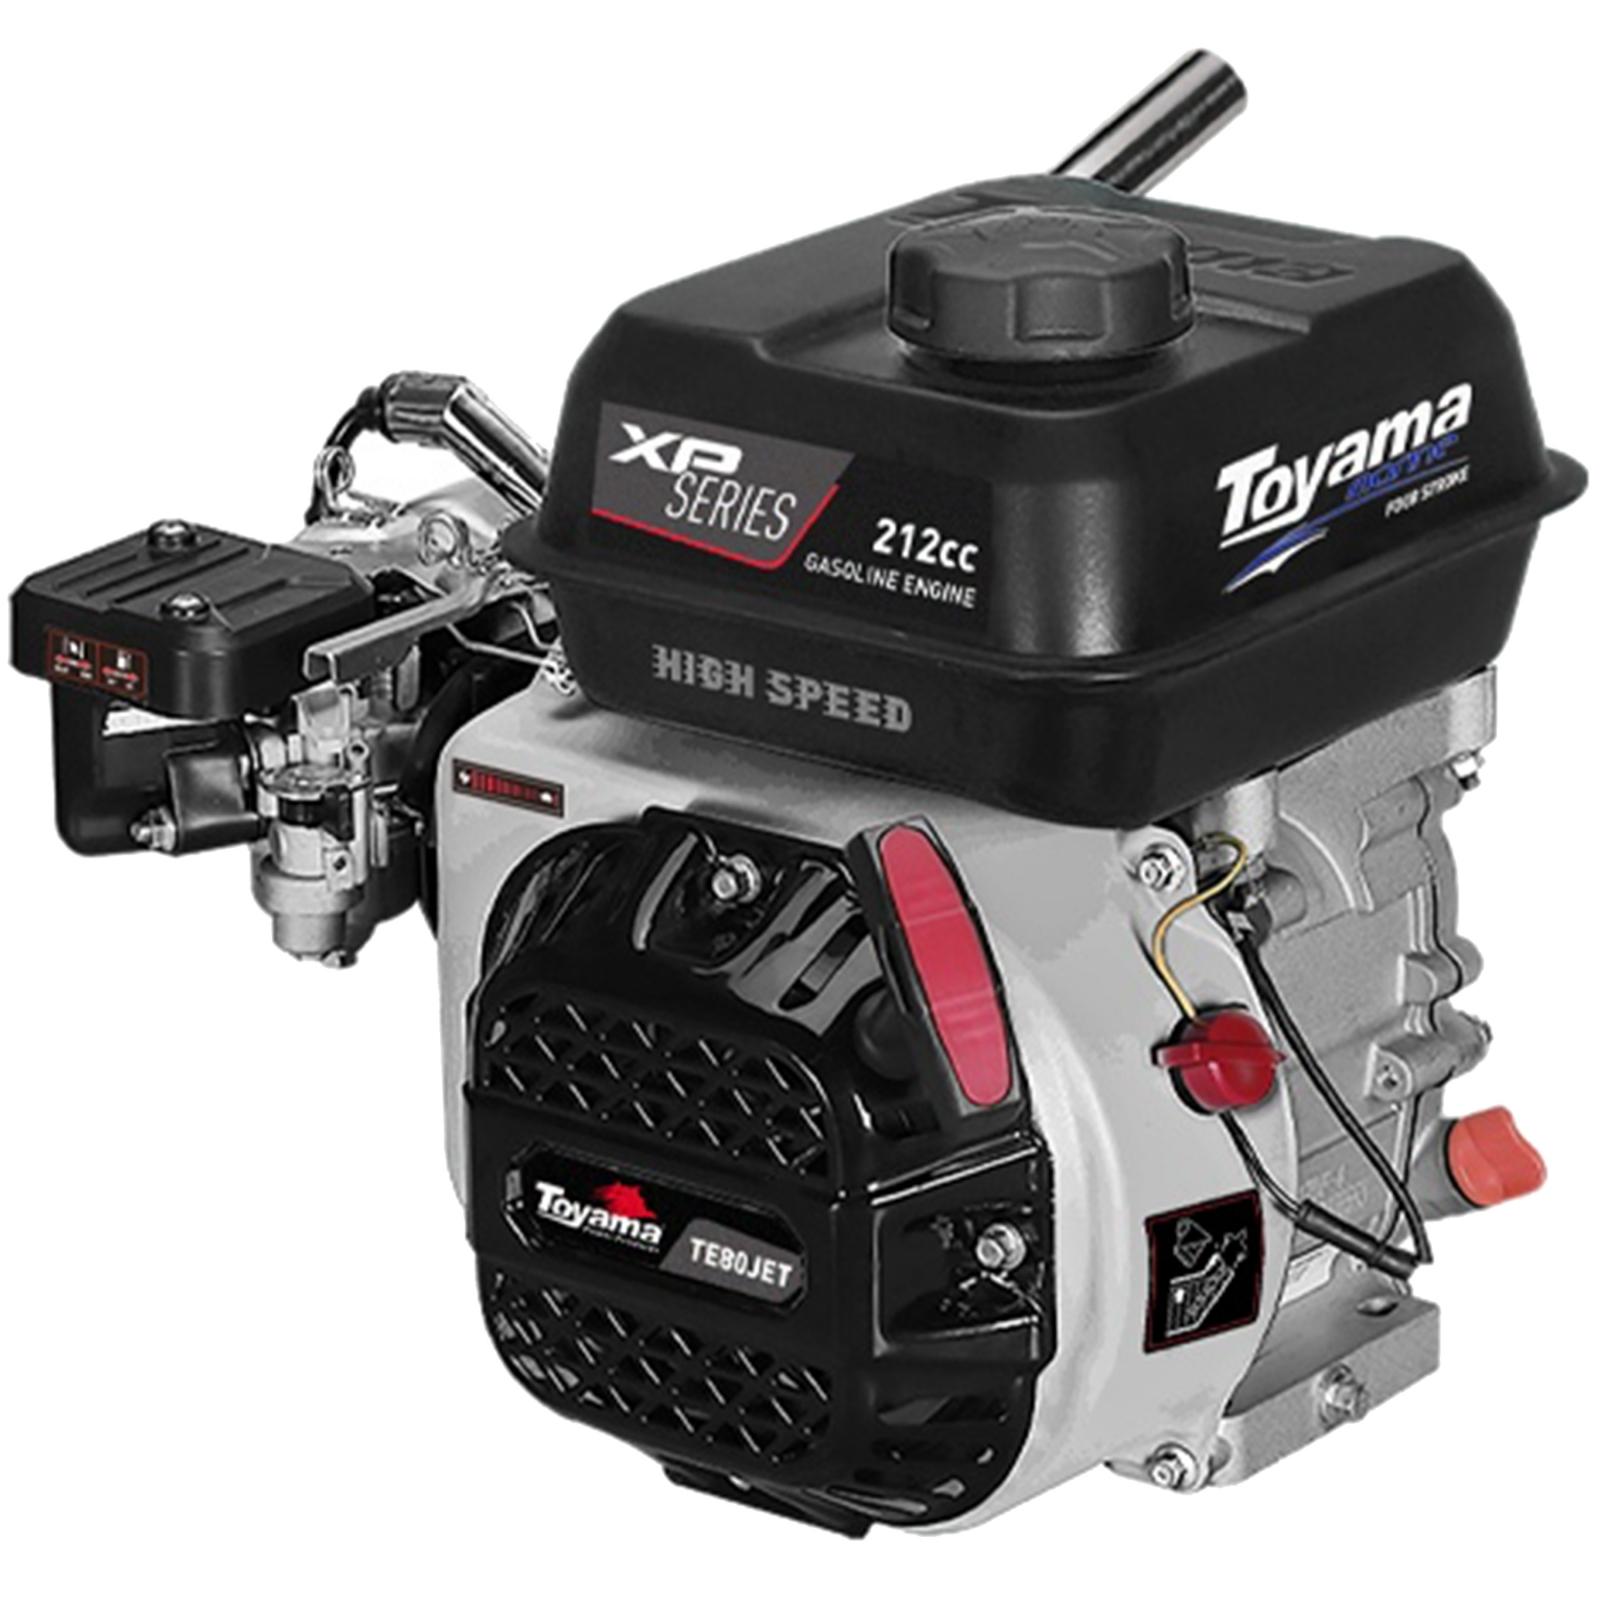 Motor De Popa A Gasolina 8hp Toyama Te80jet Hs Xp 4600rpm - Ferramentas MEP